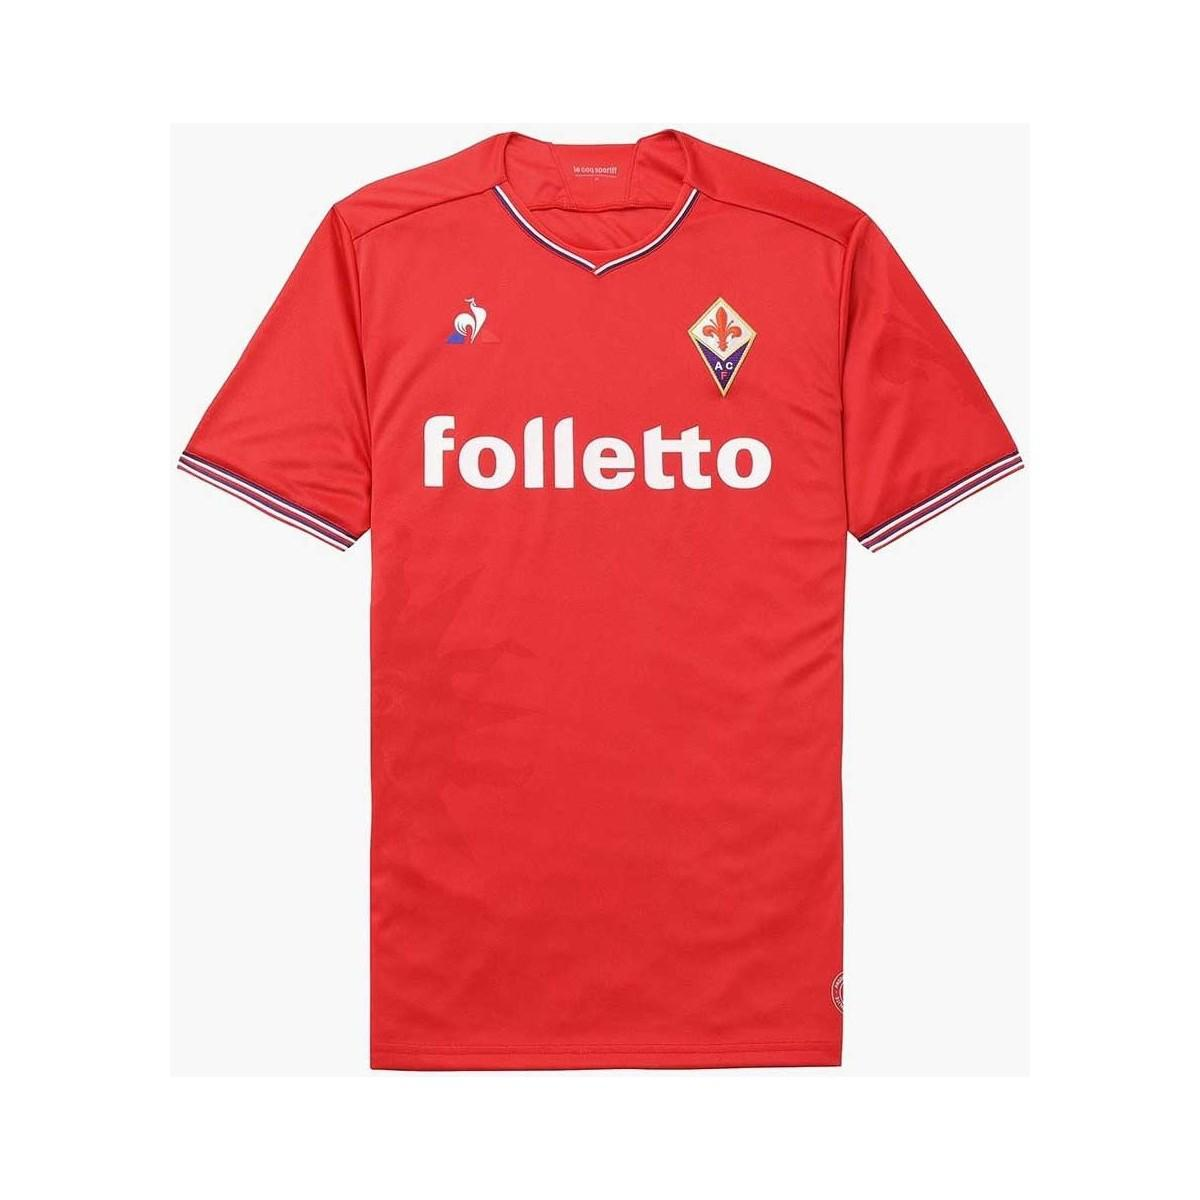 464b53976 Le Coq Sportif 2017-2018 Fiorentina Third Football Shirt Women s T ...